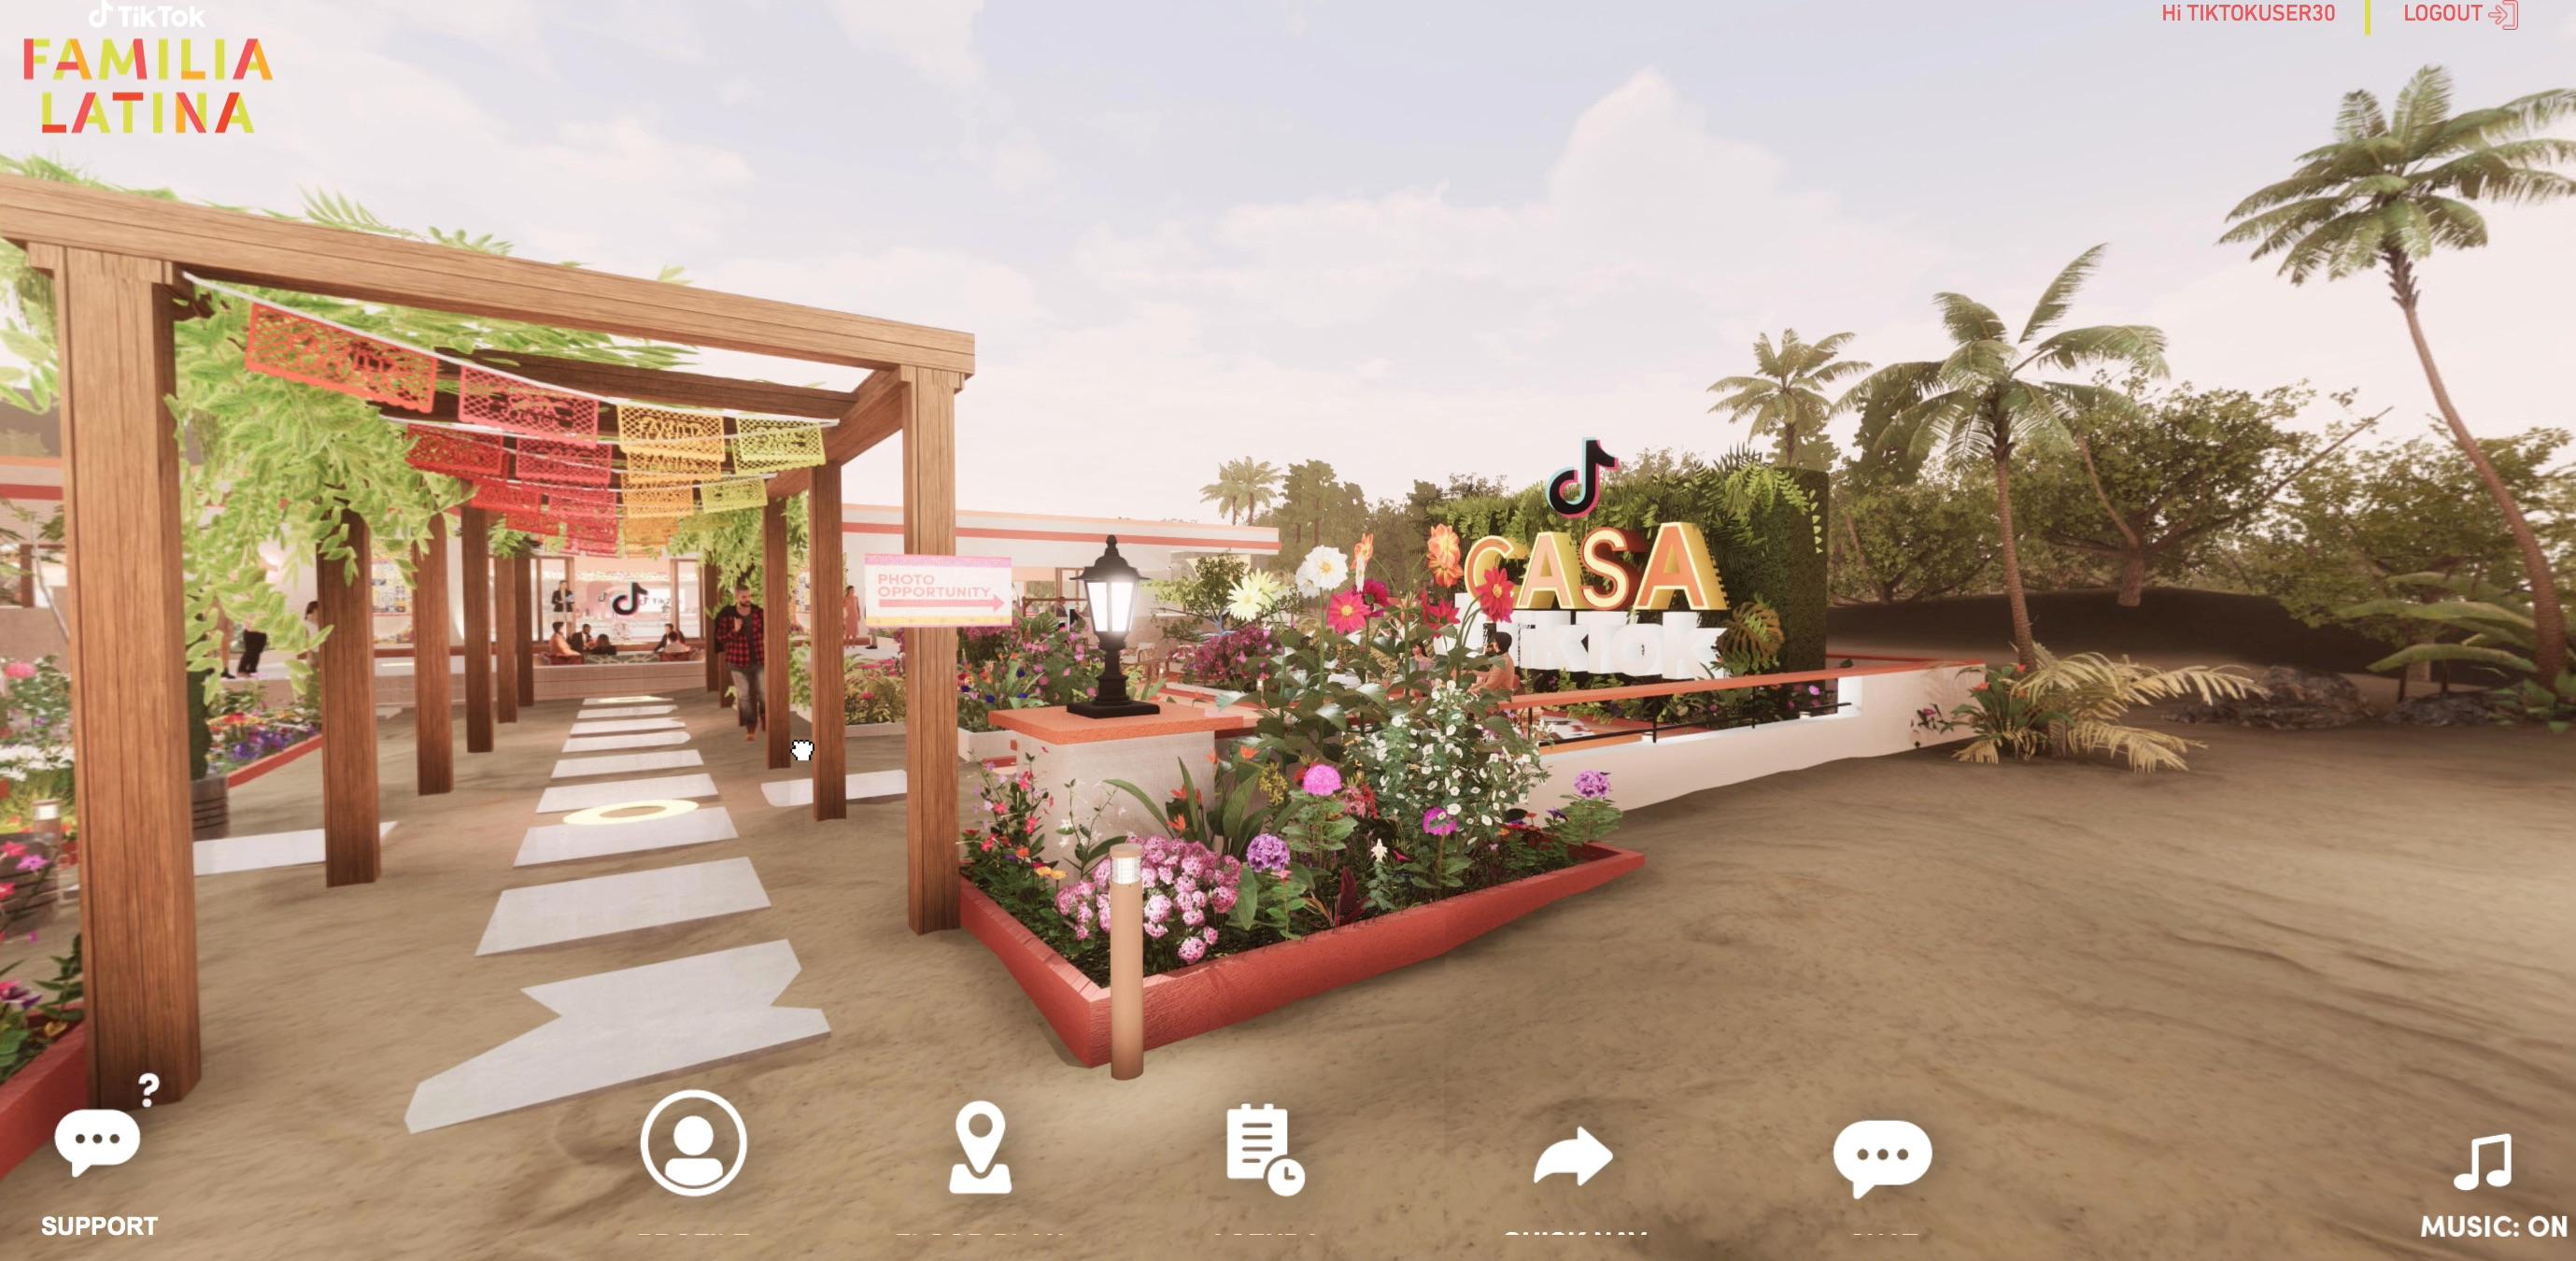 TikTok La Familia Latina Virtual Event Design OUTDOOR SPACE